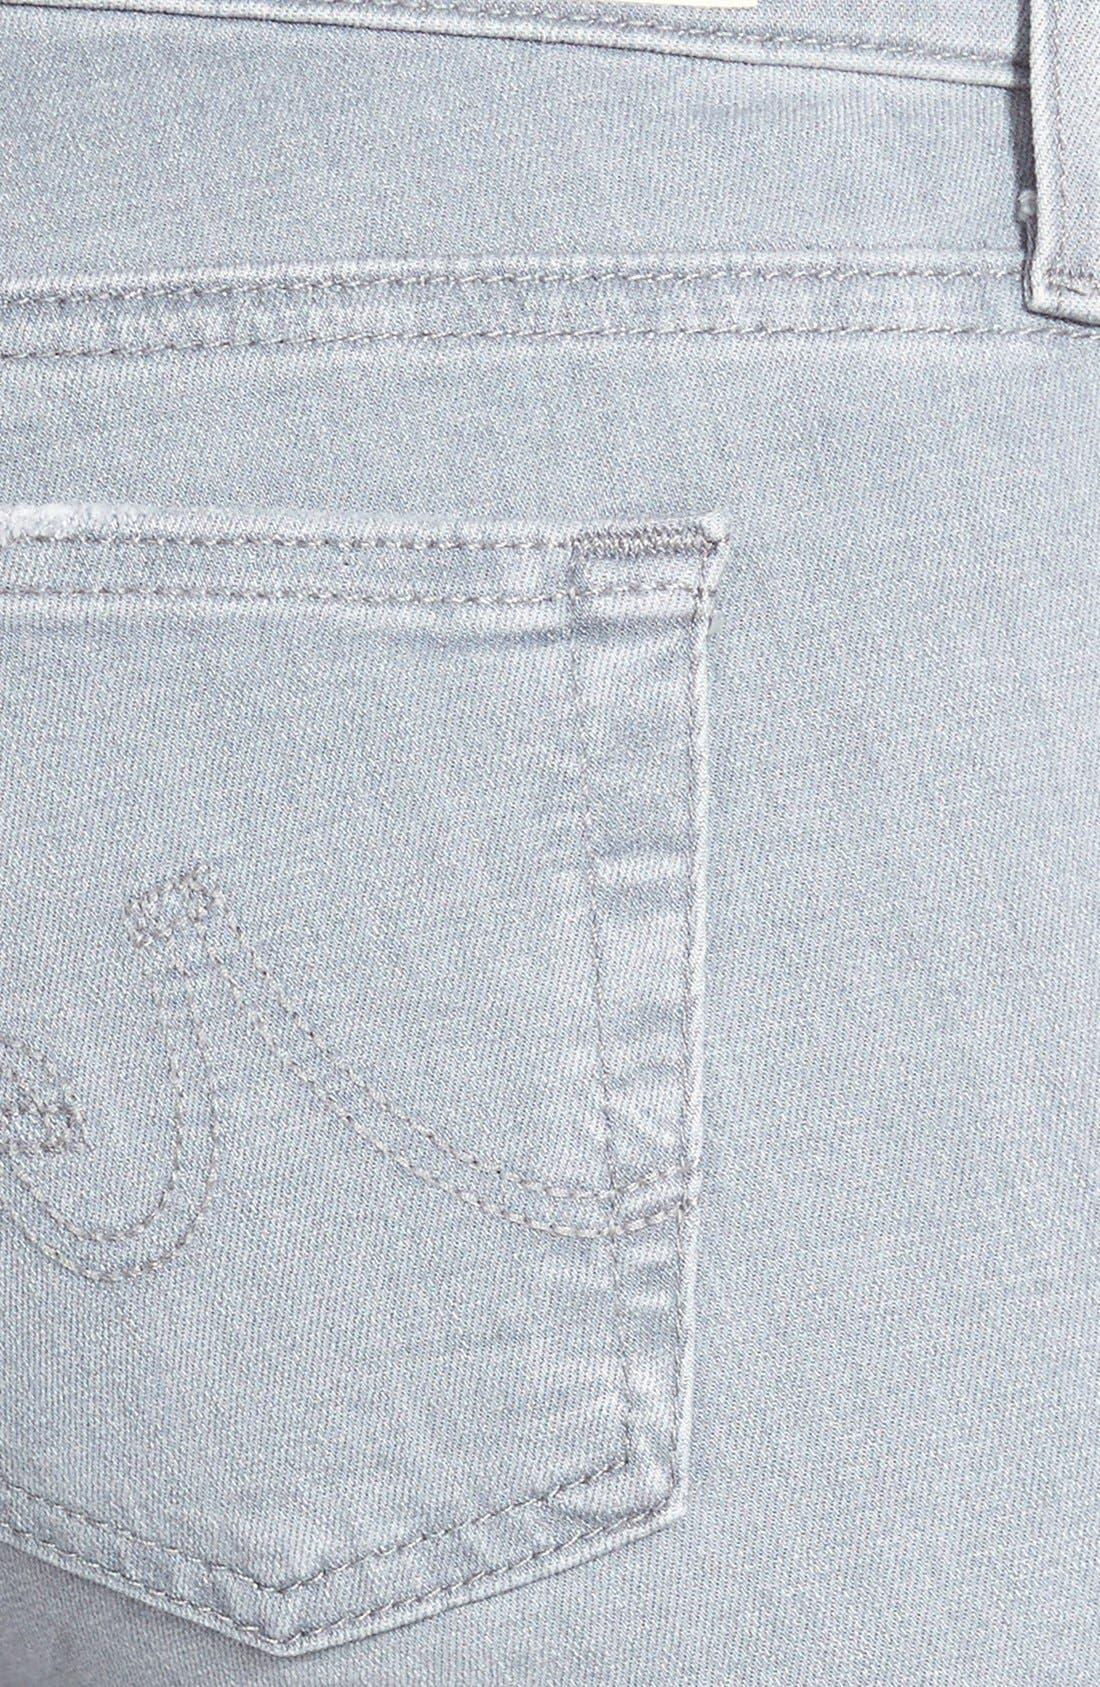 Alternate Image 3  - AG Ankle Super Skinny Jeans (10 Years Light Onyx Destroyed)